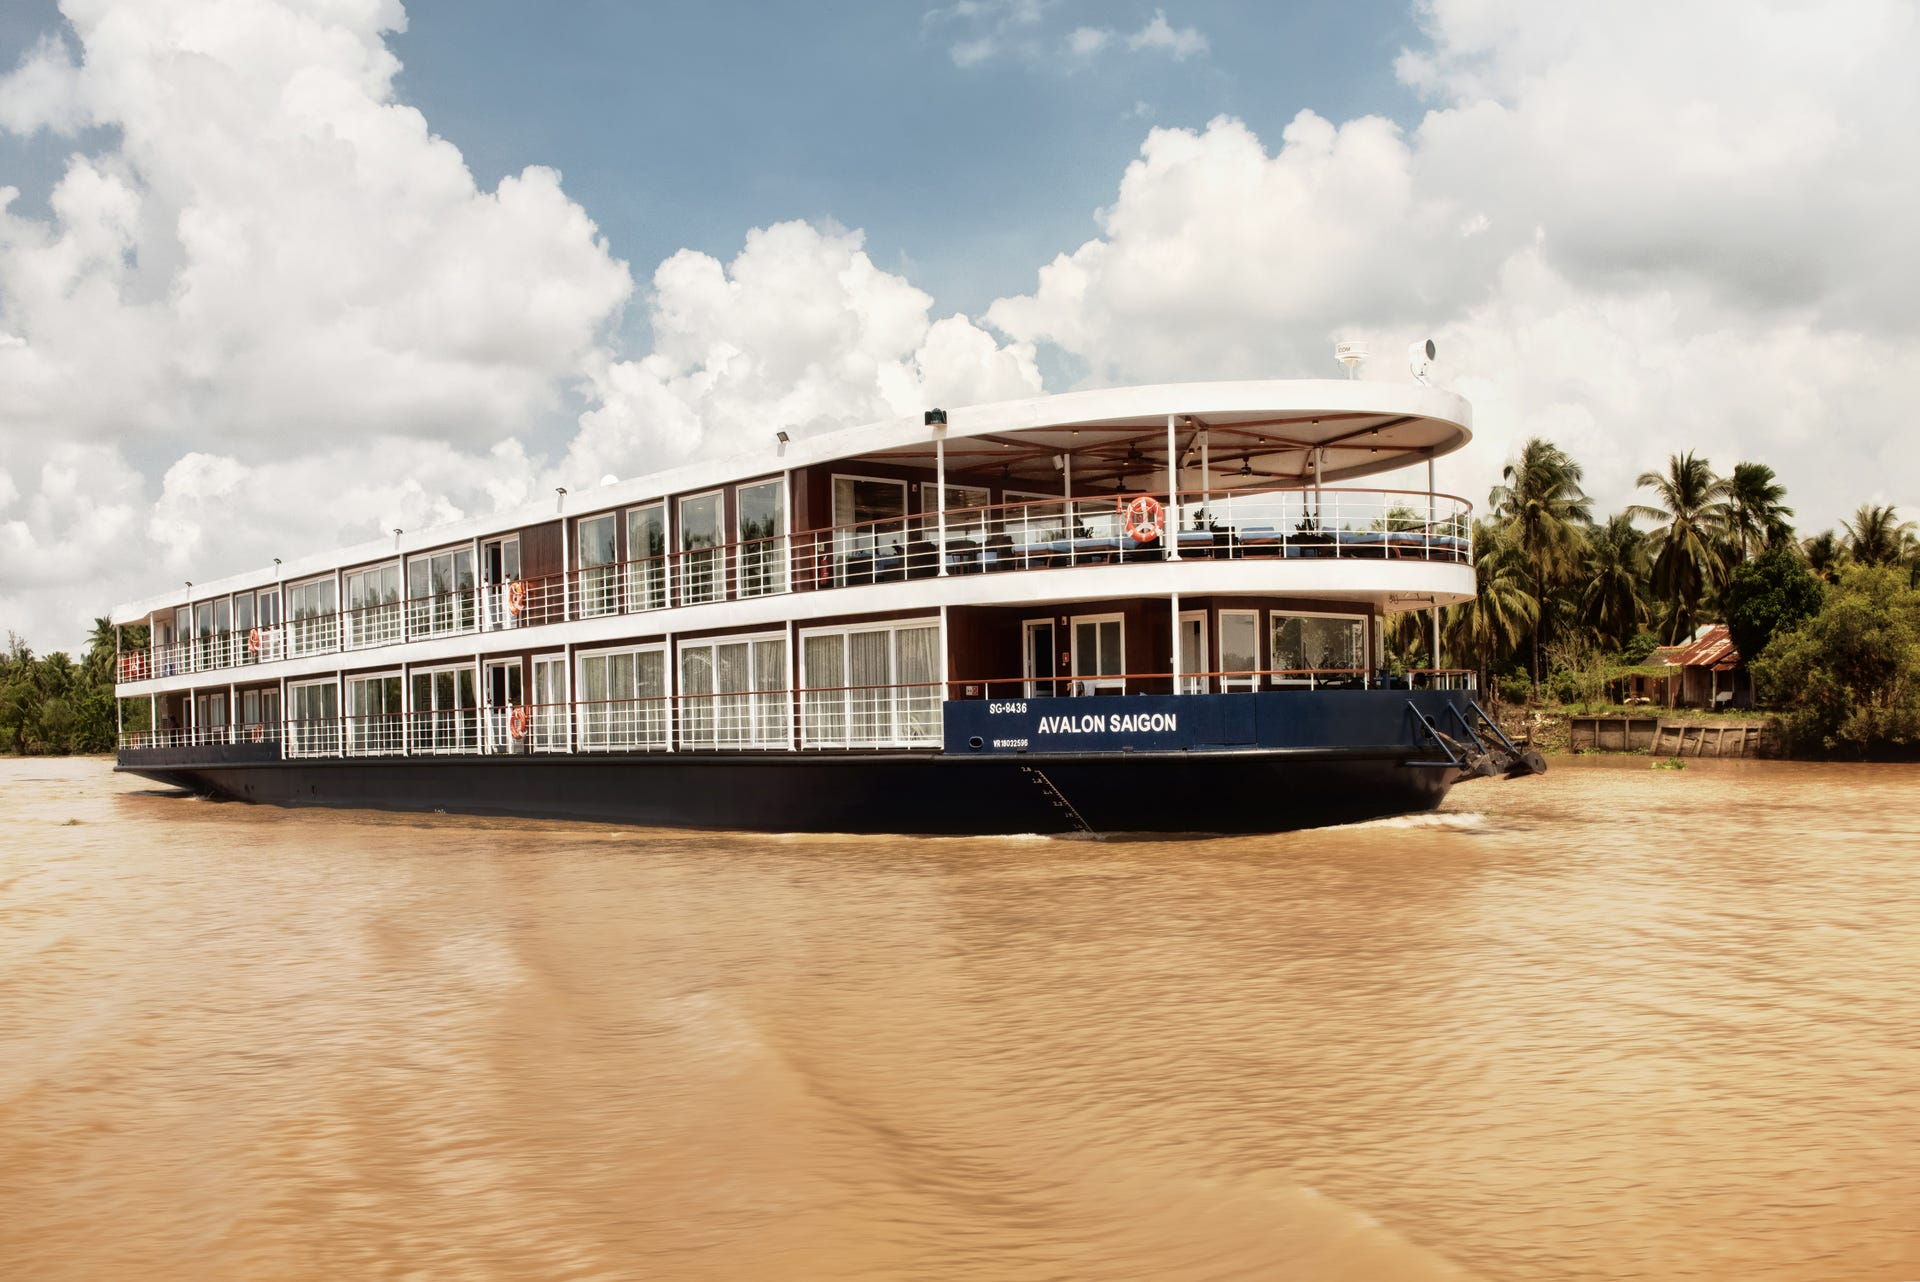 Avalon Saigon: New Avalon Waterways Mekong River ship in photos